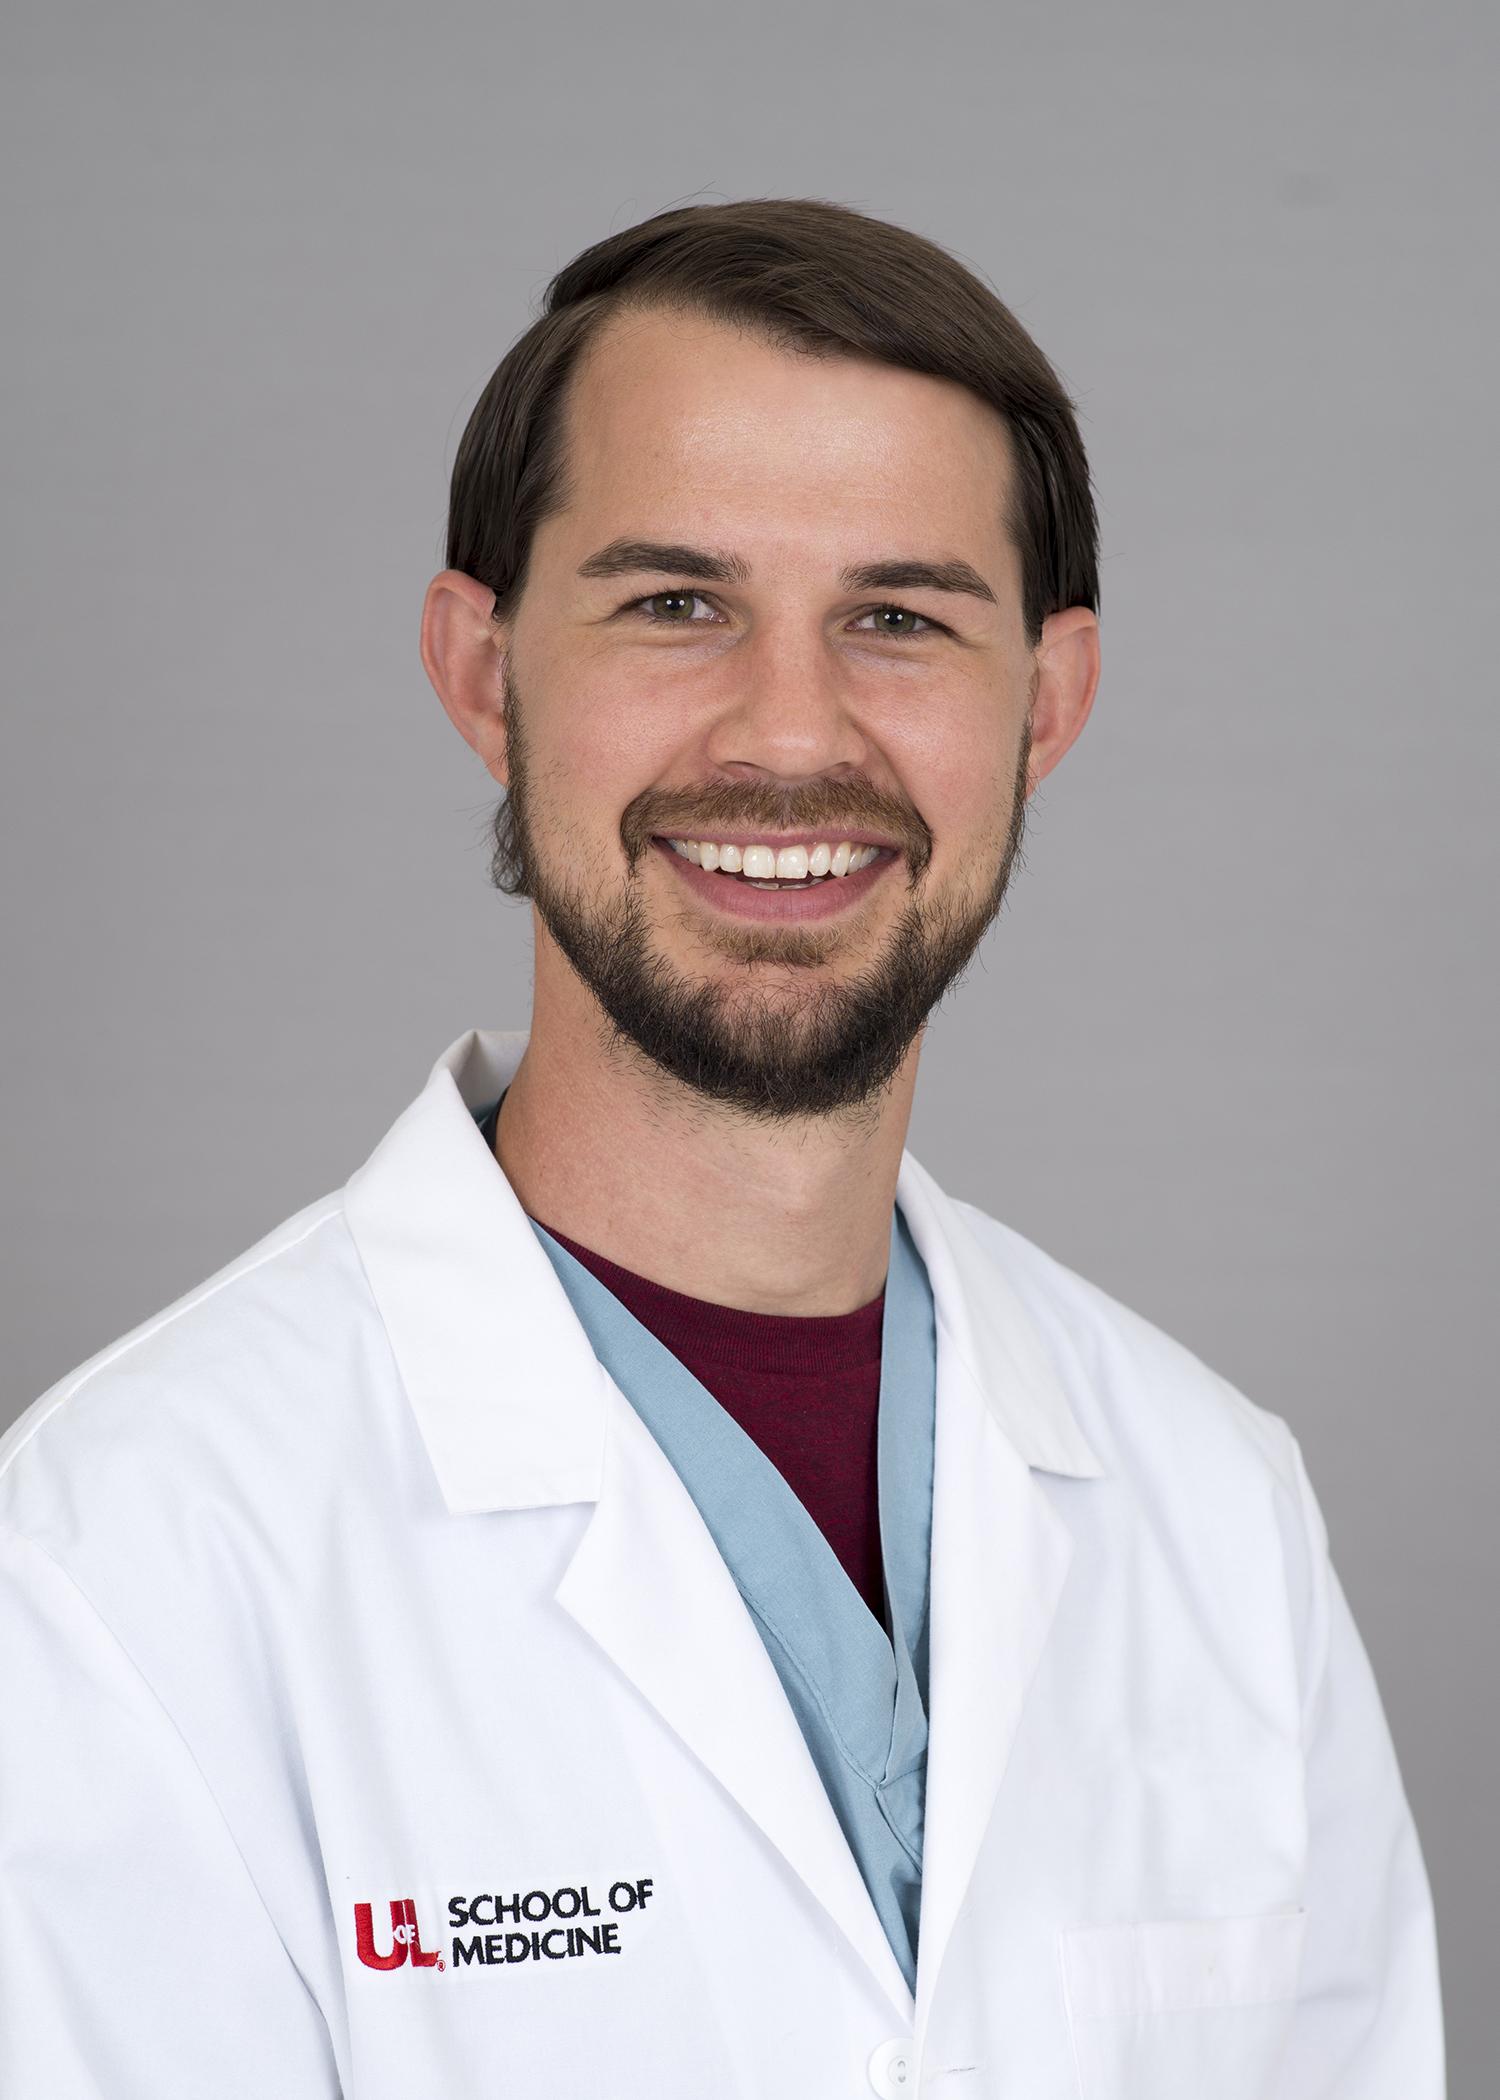 Dr. Jerrad Bussinger